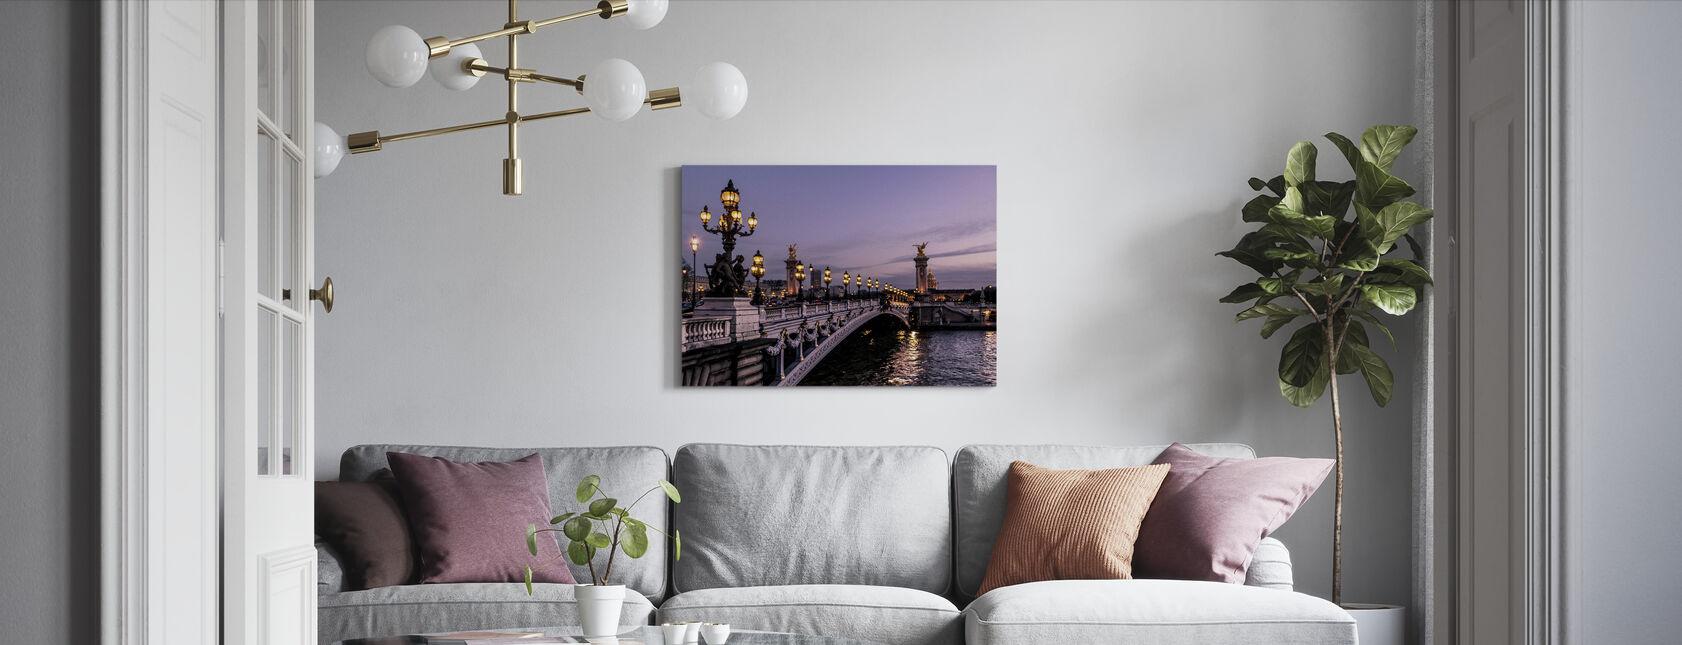 Bridge - Canvas print - Living Room